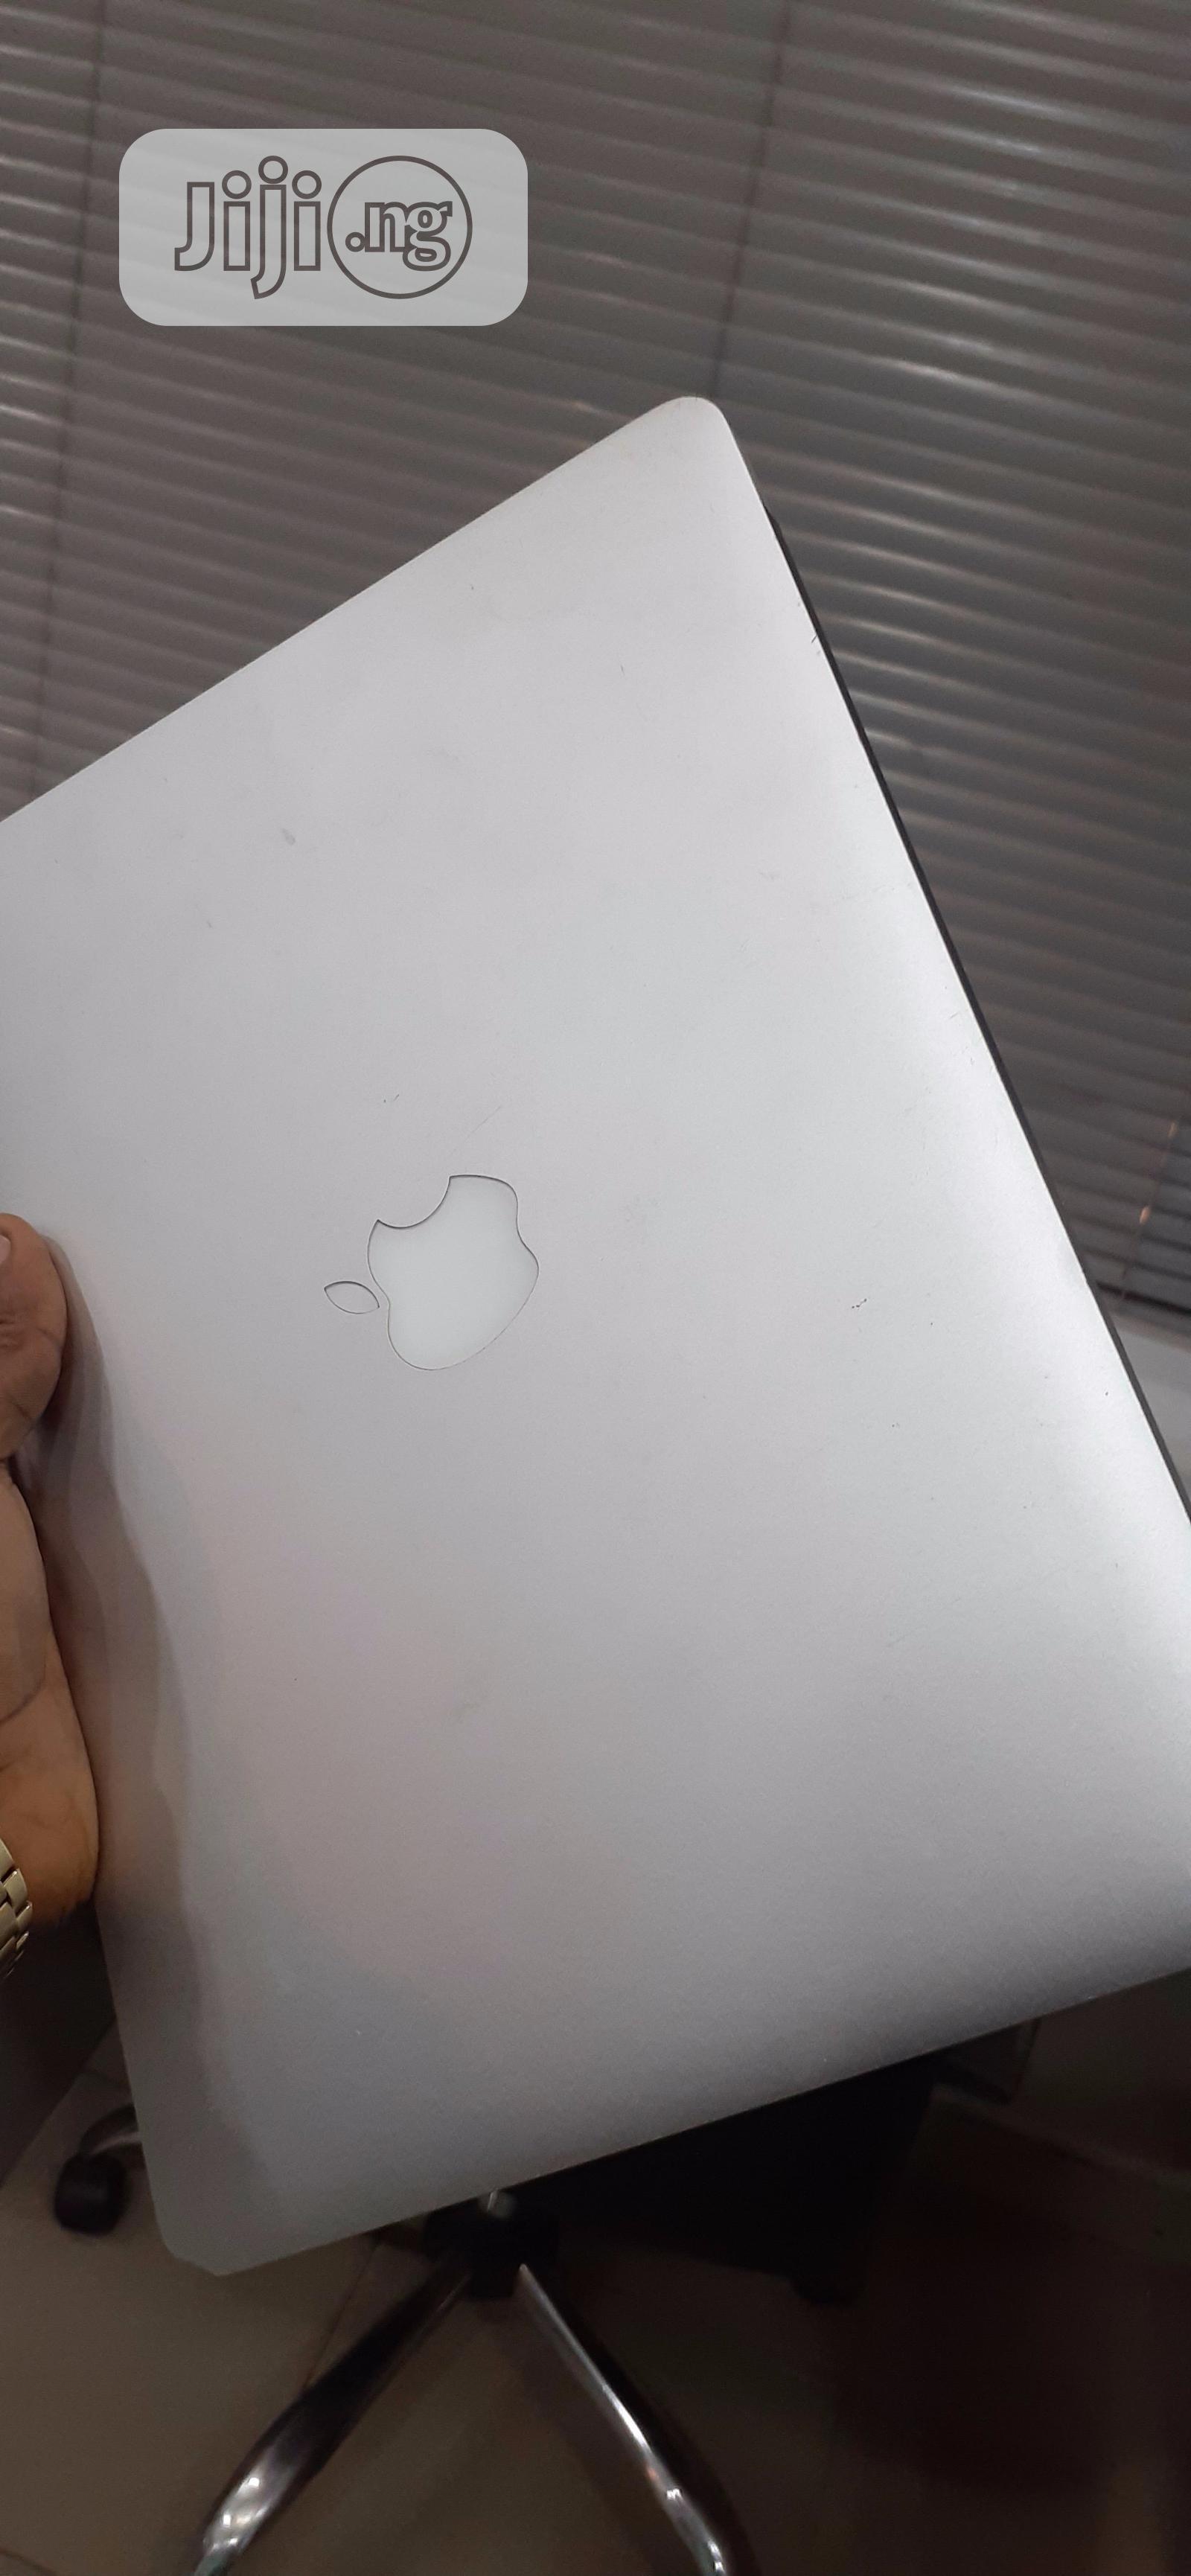 Archive: Laptop Apple MacBook Air 2012 4GB Intel Core I5 128GB